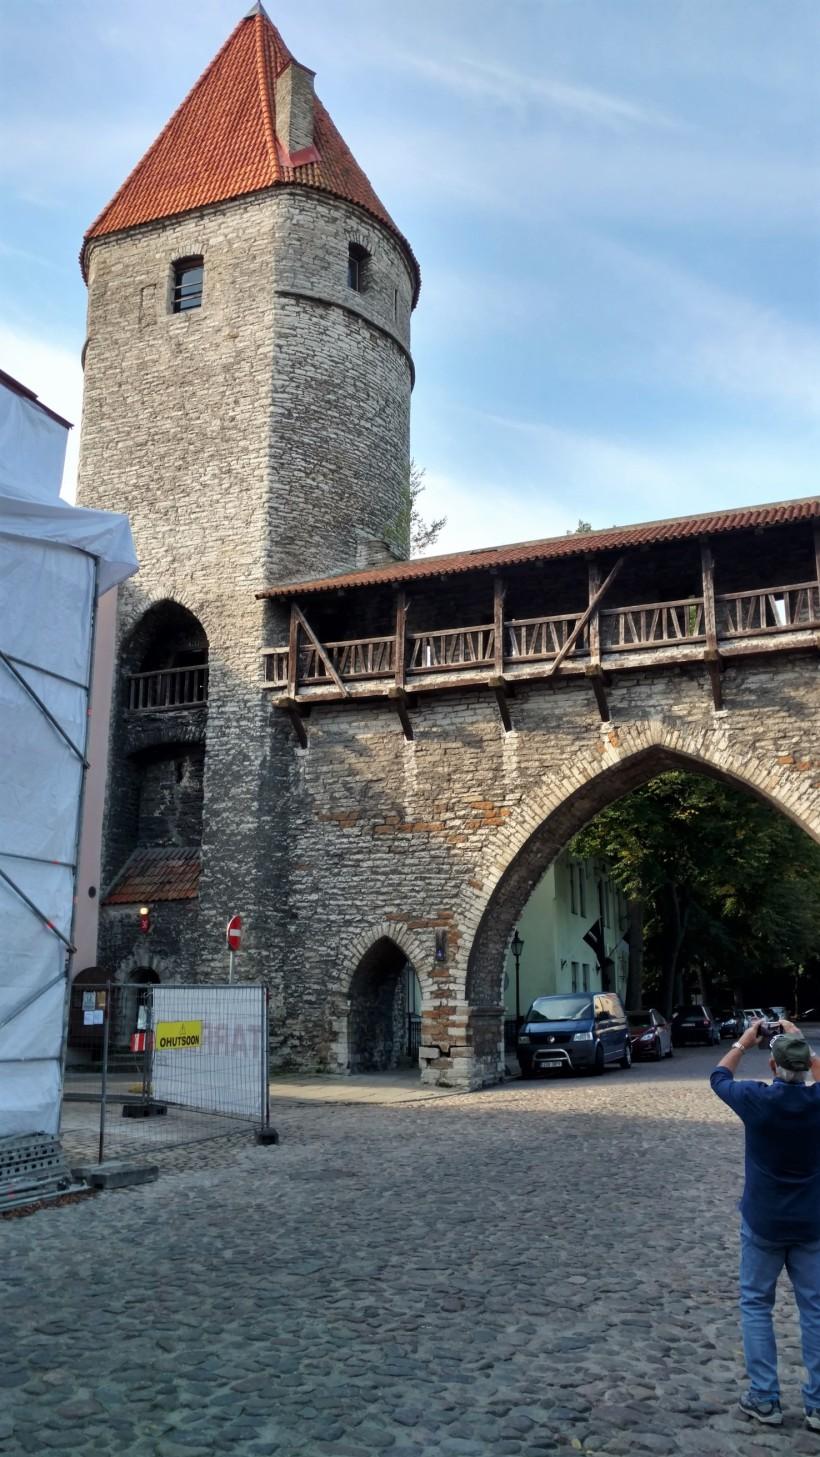 tallinn-estonia-highlight-tour-and-outside-museum-013a